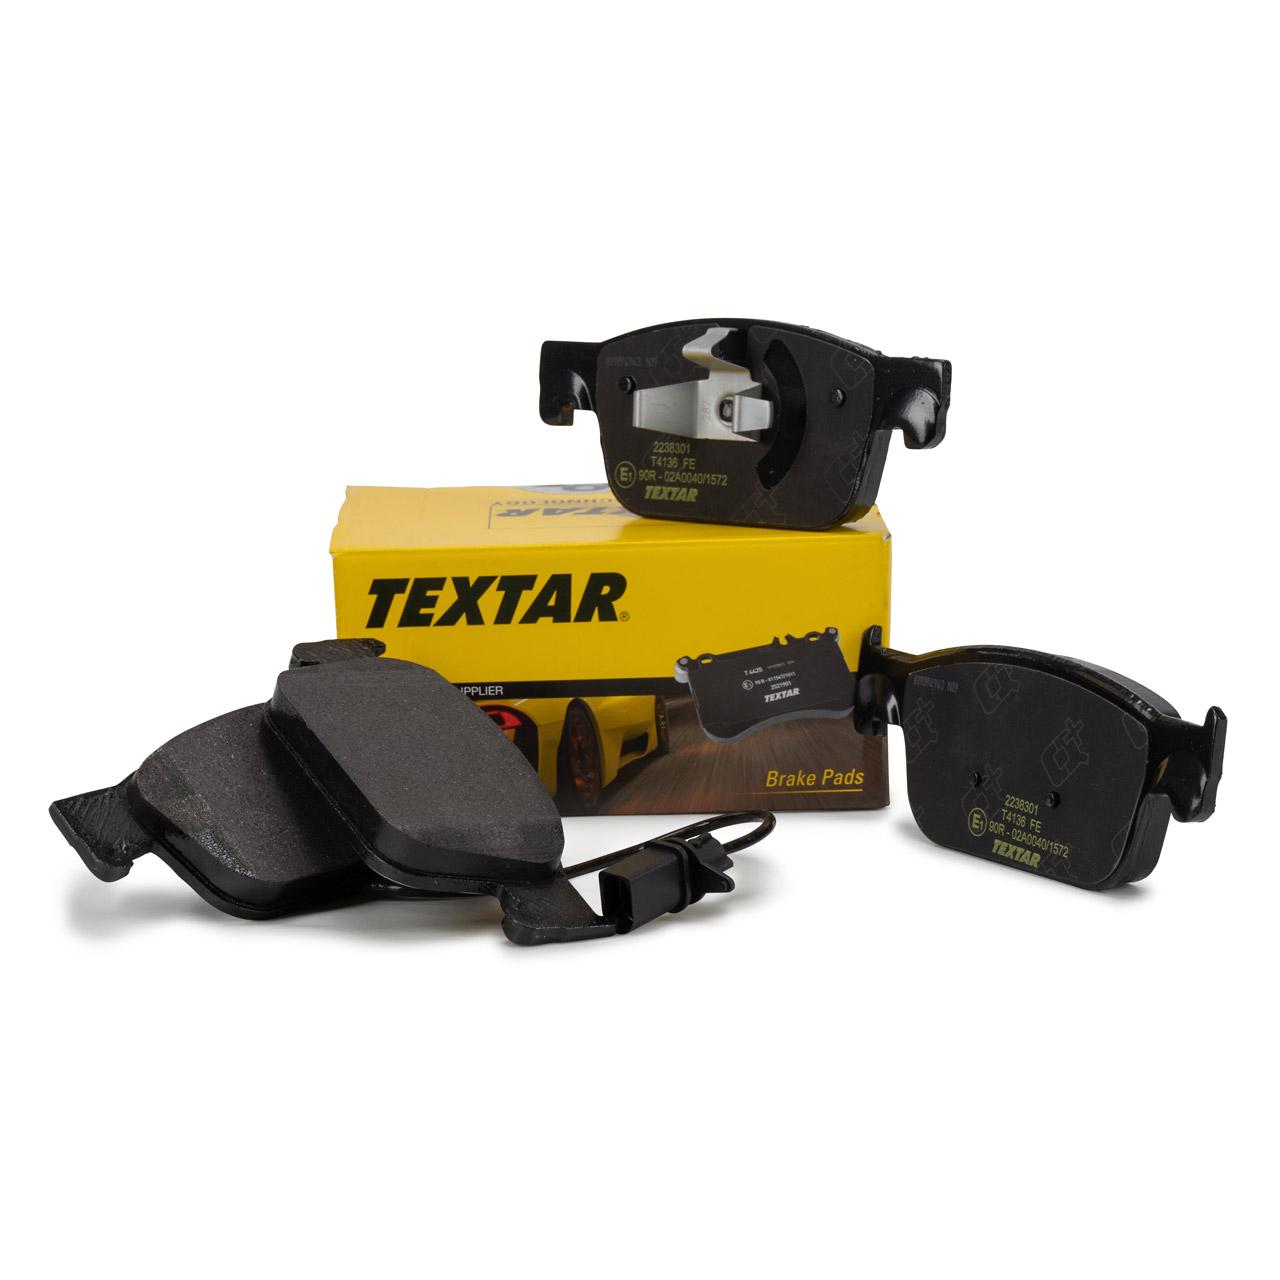 TEXTAR Bremsbeläge + Warnkontakt AUDI A4 B9 A5 F5 PR-1LA/1LB 2238301 vorne